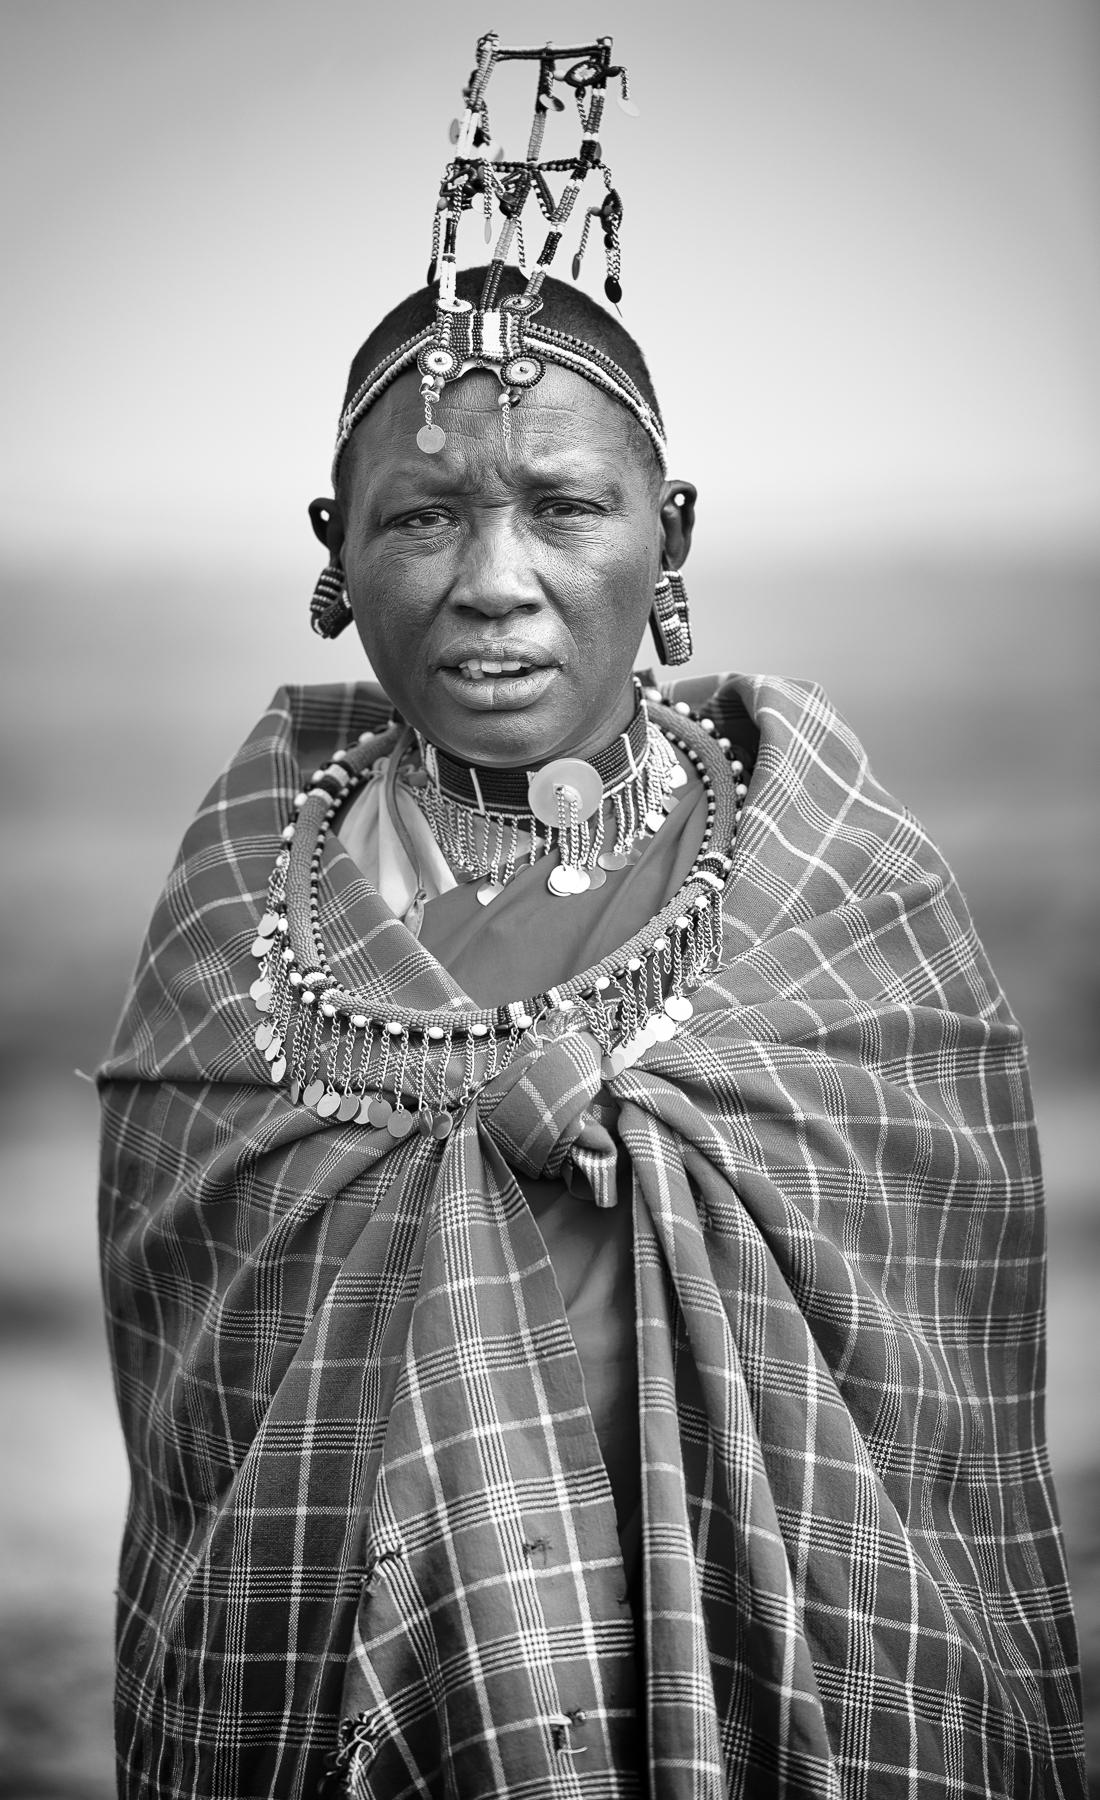 CARLA_DeDOMINICIS_Women of the Tribe-Maasai1-3.jpg